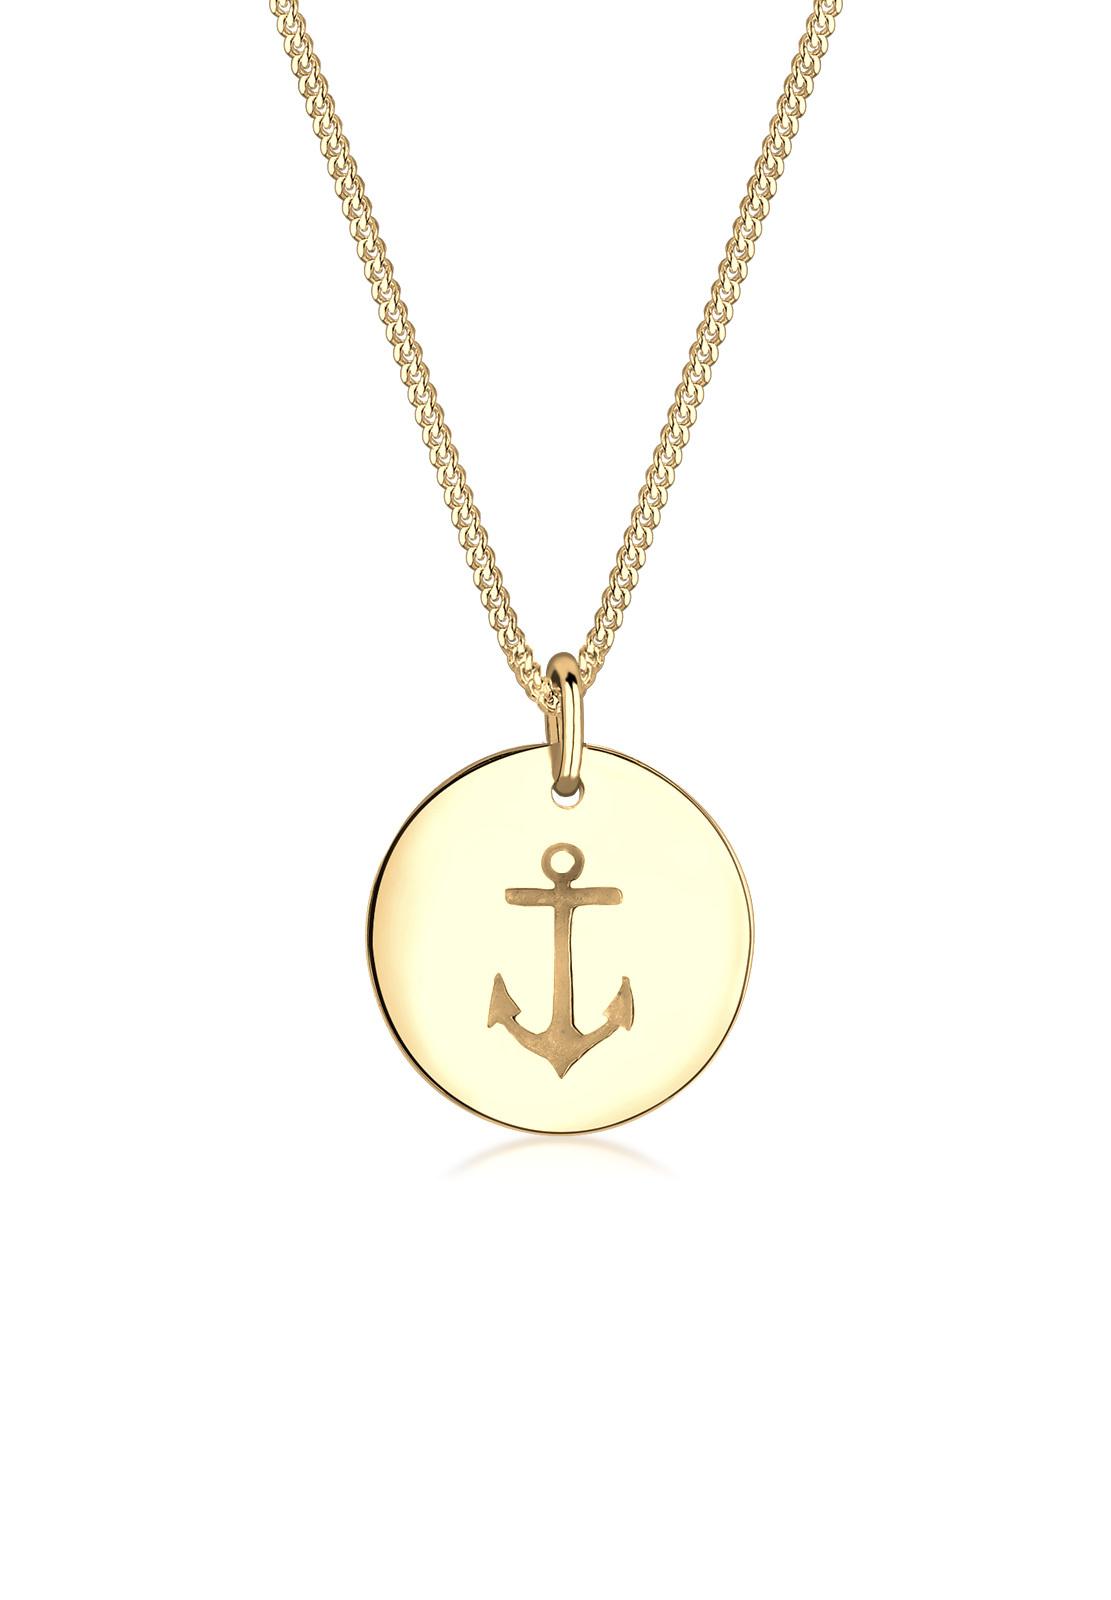 Halskette Anker | 925 Sterling Silber vergoldet